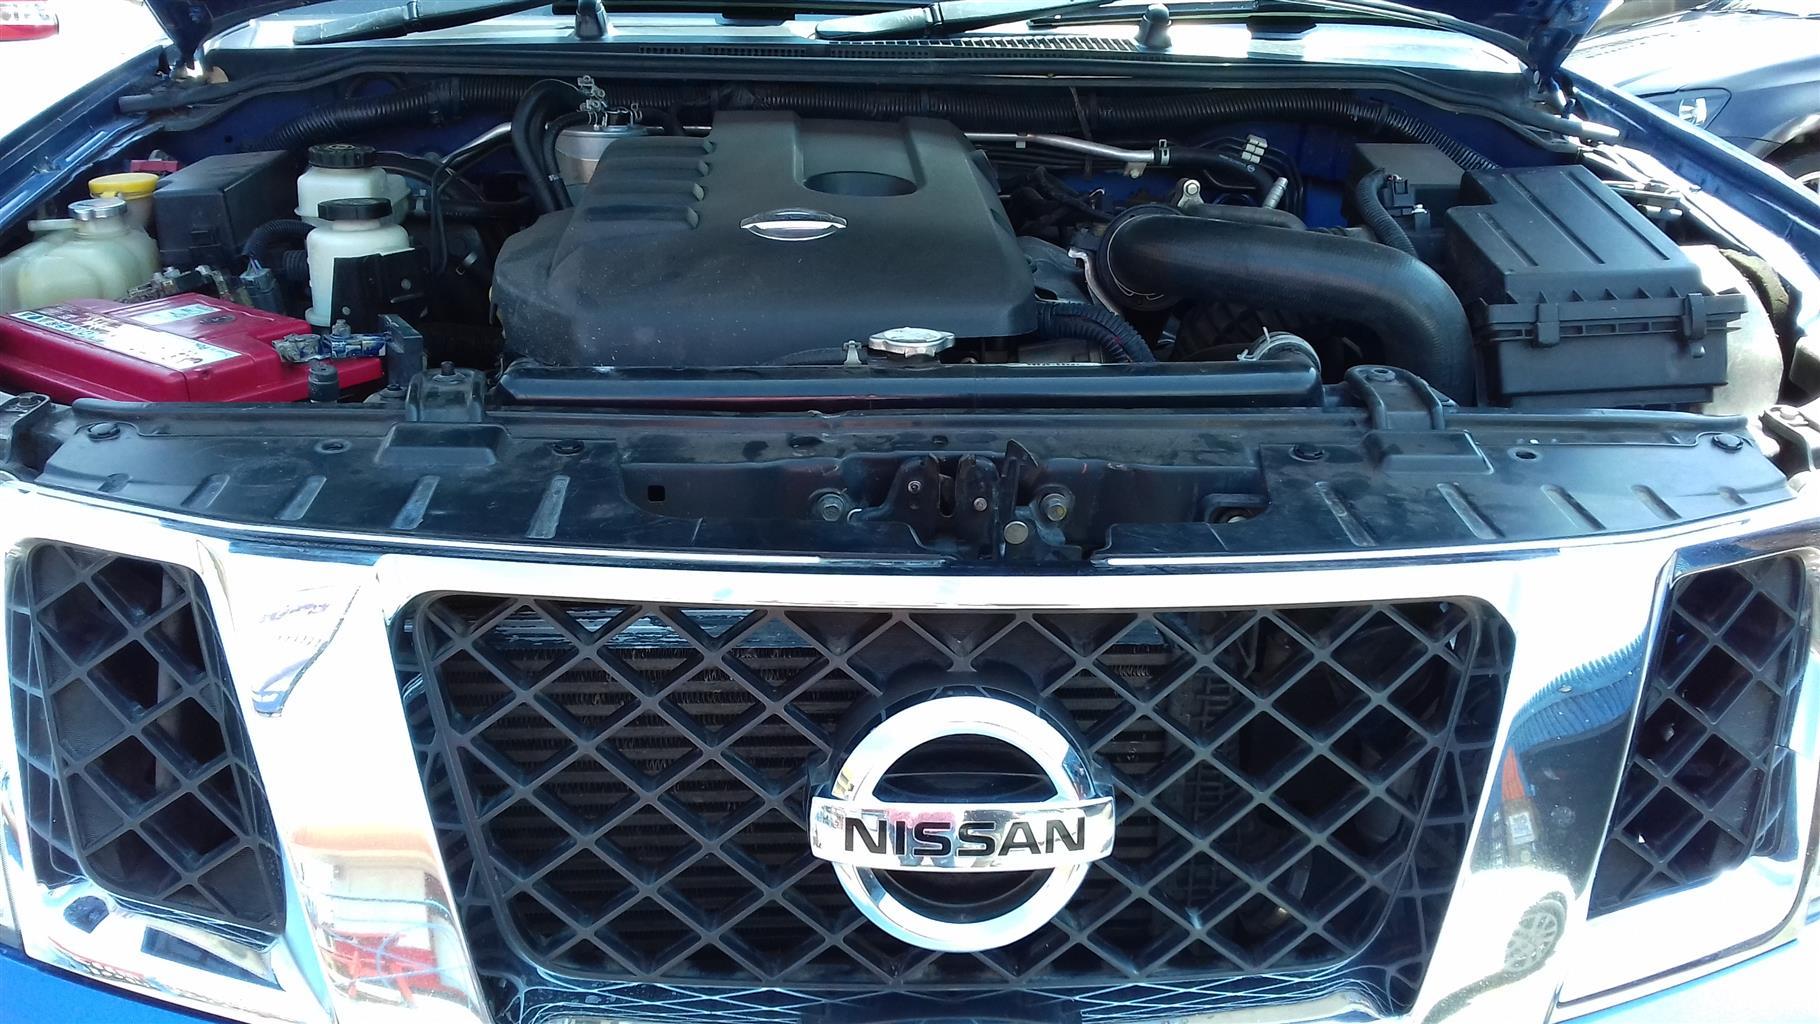 2012 Nissan Navara 2.5dCi double cab 4x4 LE